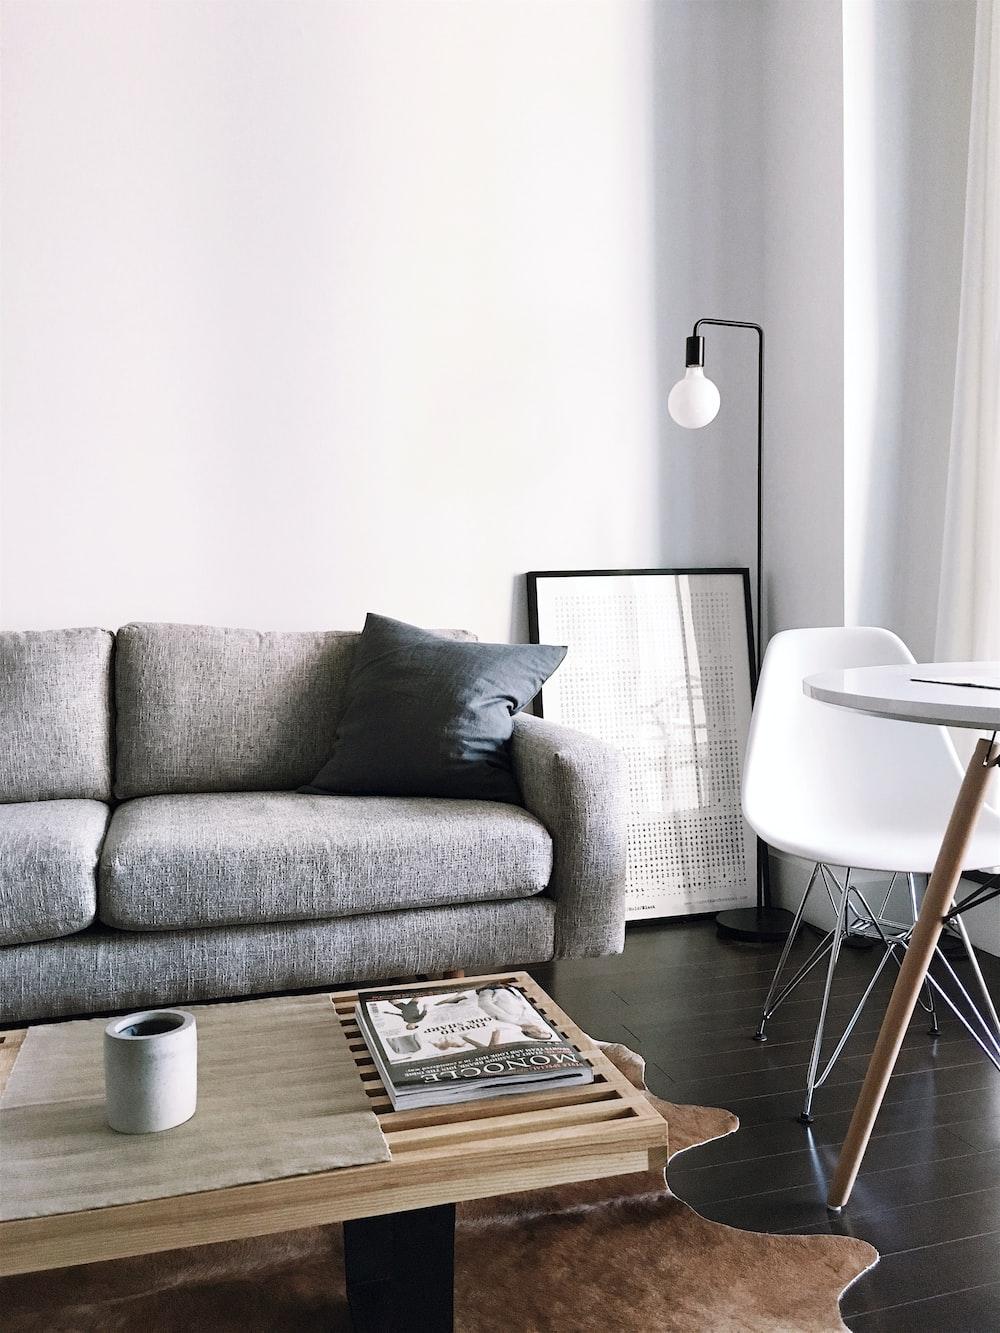 Room Design Online Free: Brown Wooden Center Table Inside Room Photo